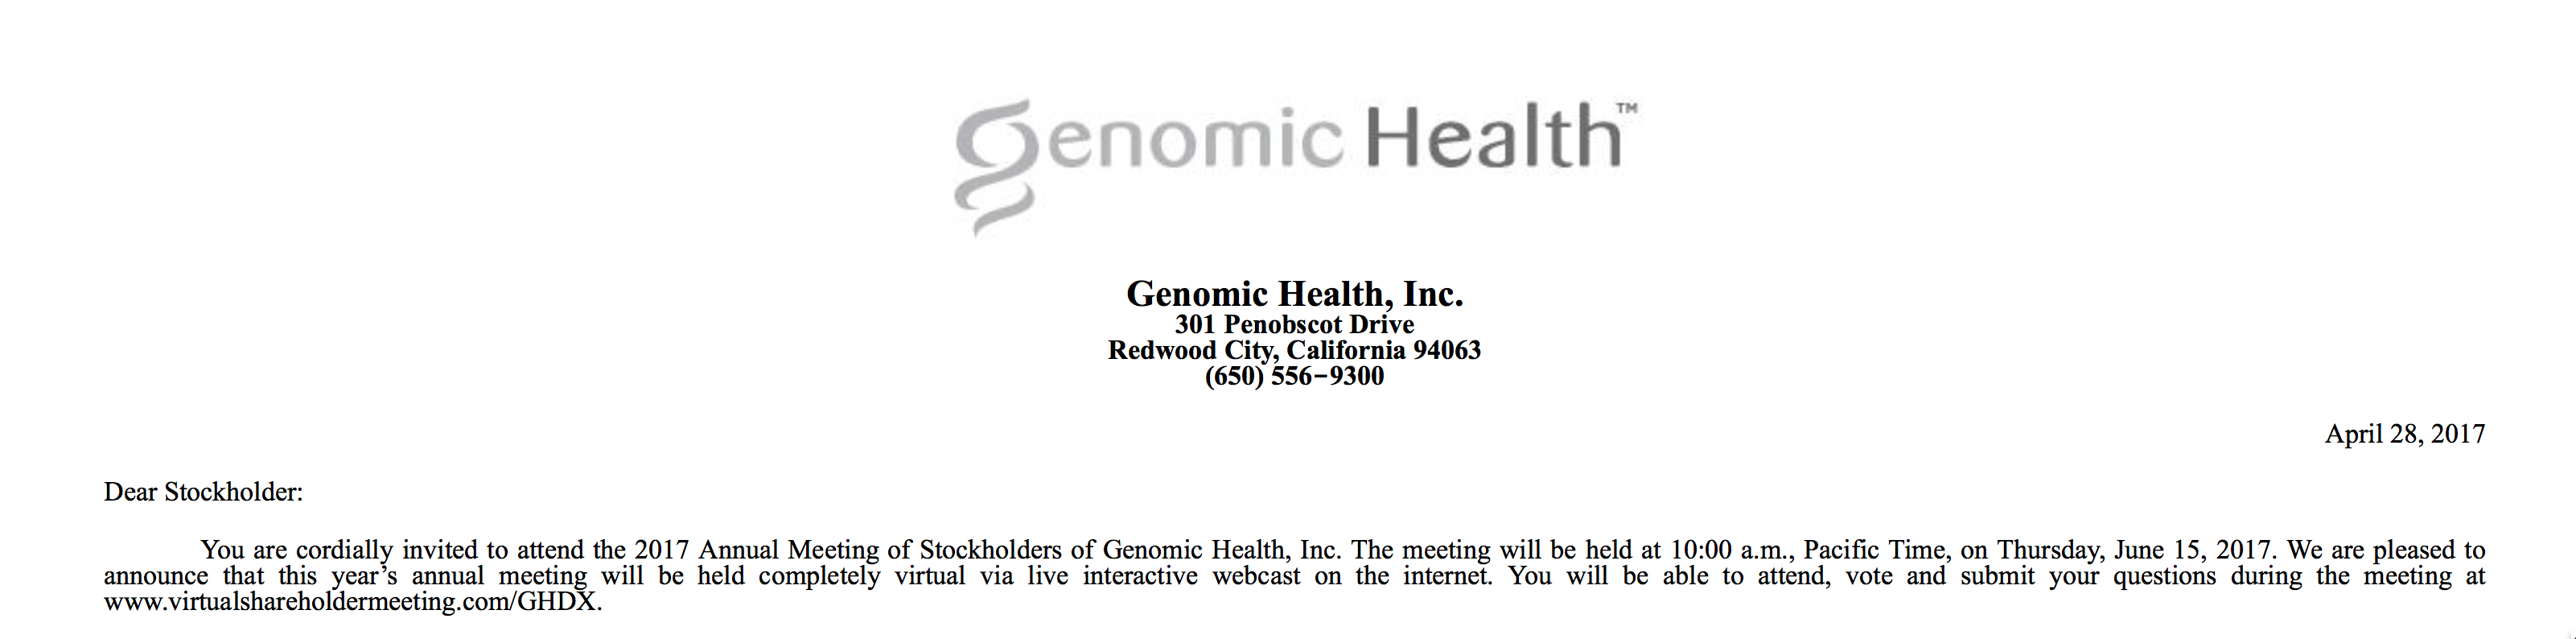 Genomic Health proxy 2017